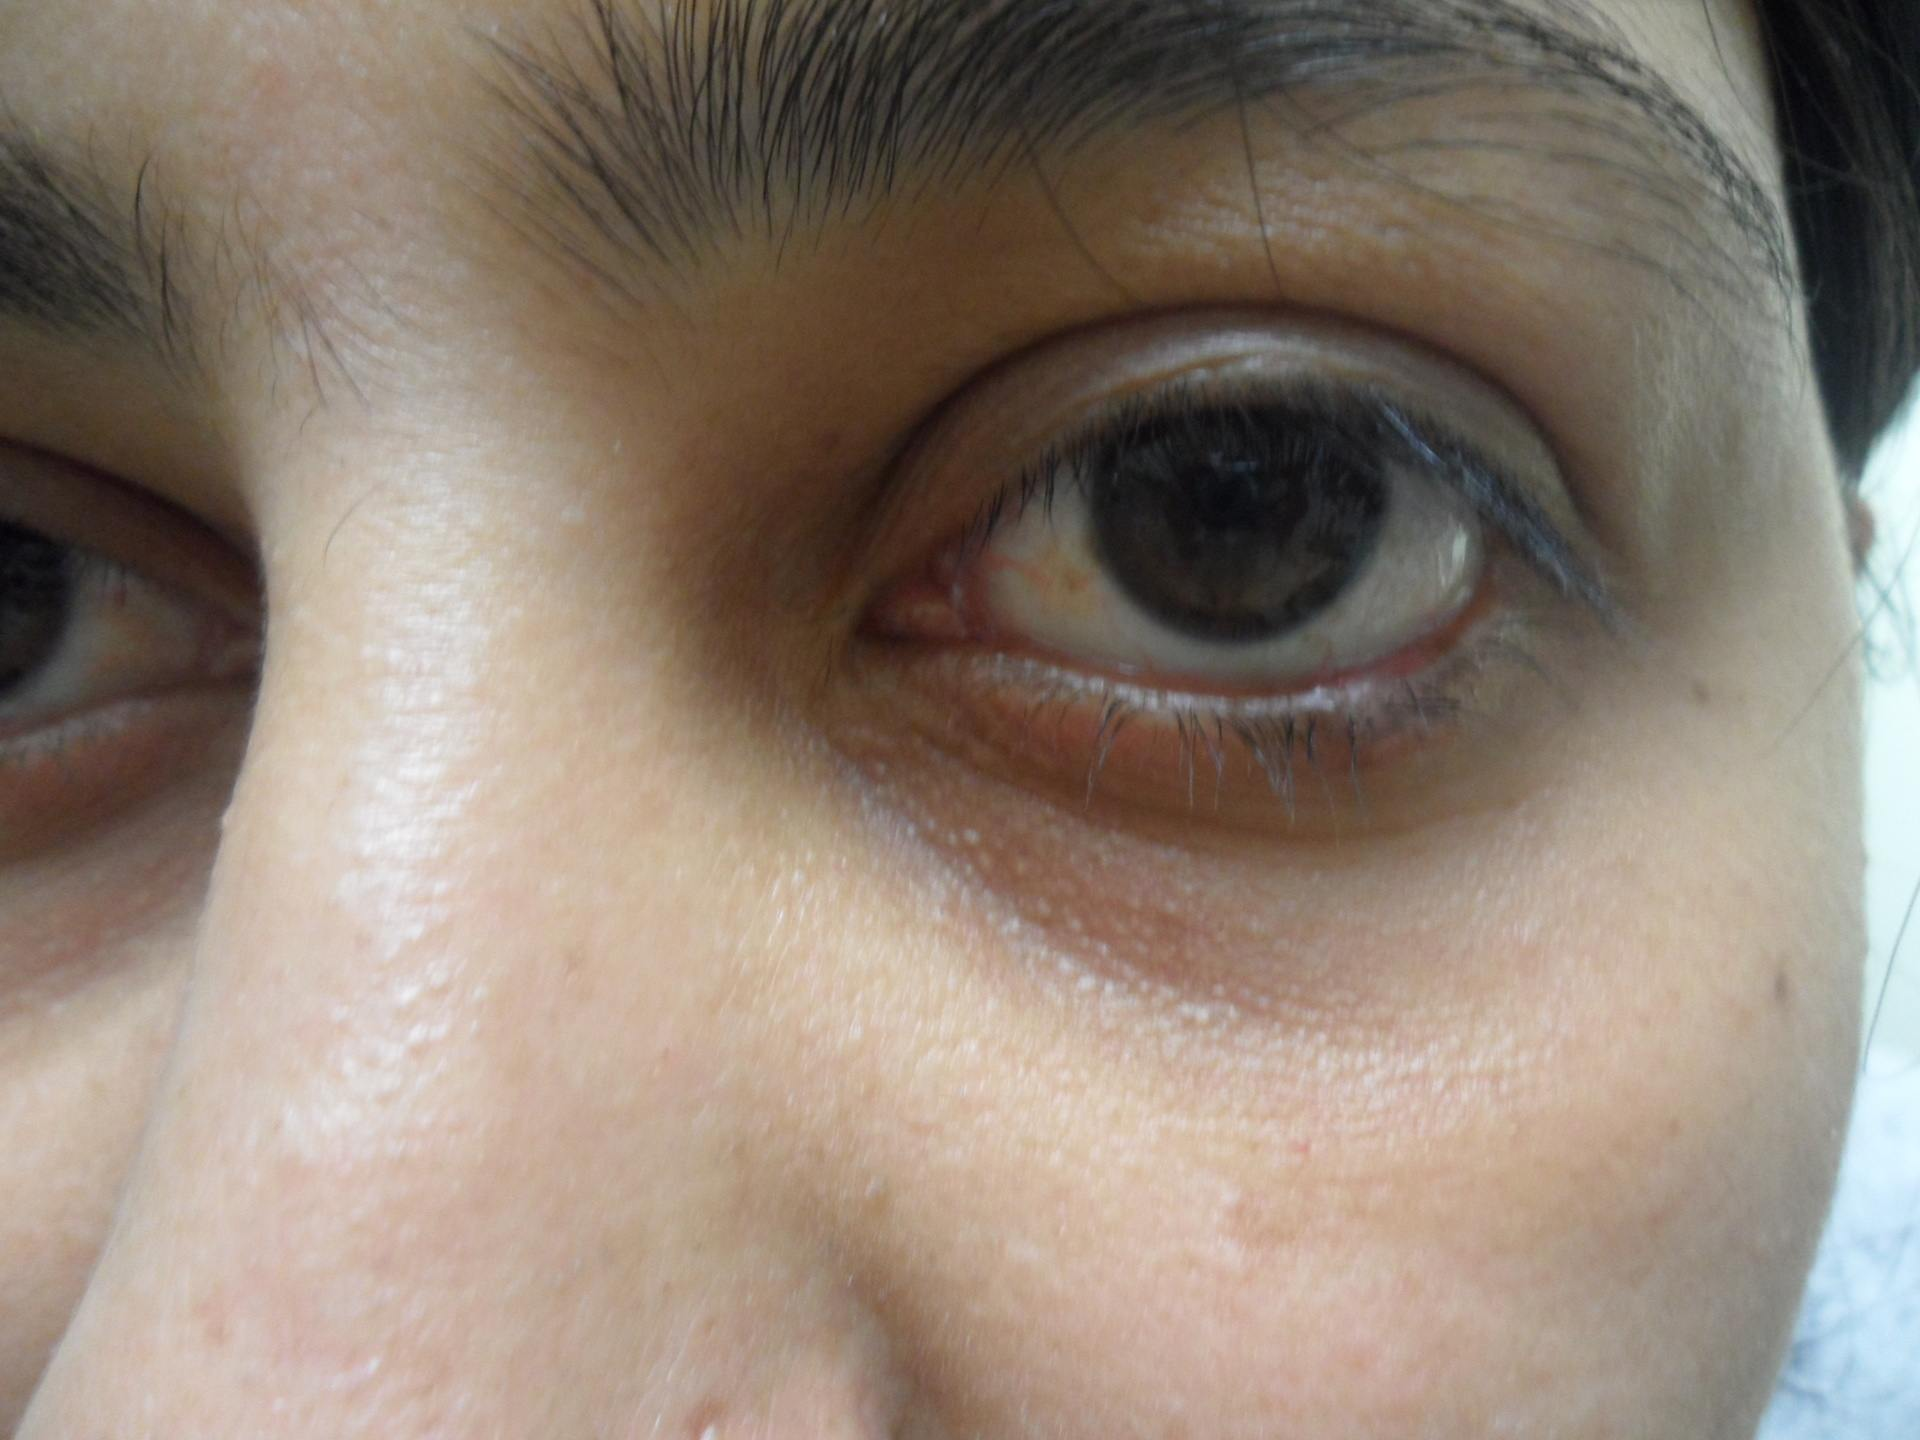 Close up of unhealthy eye